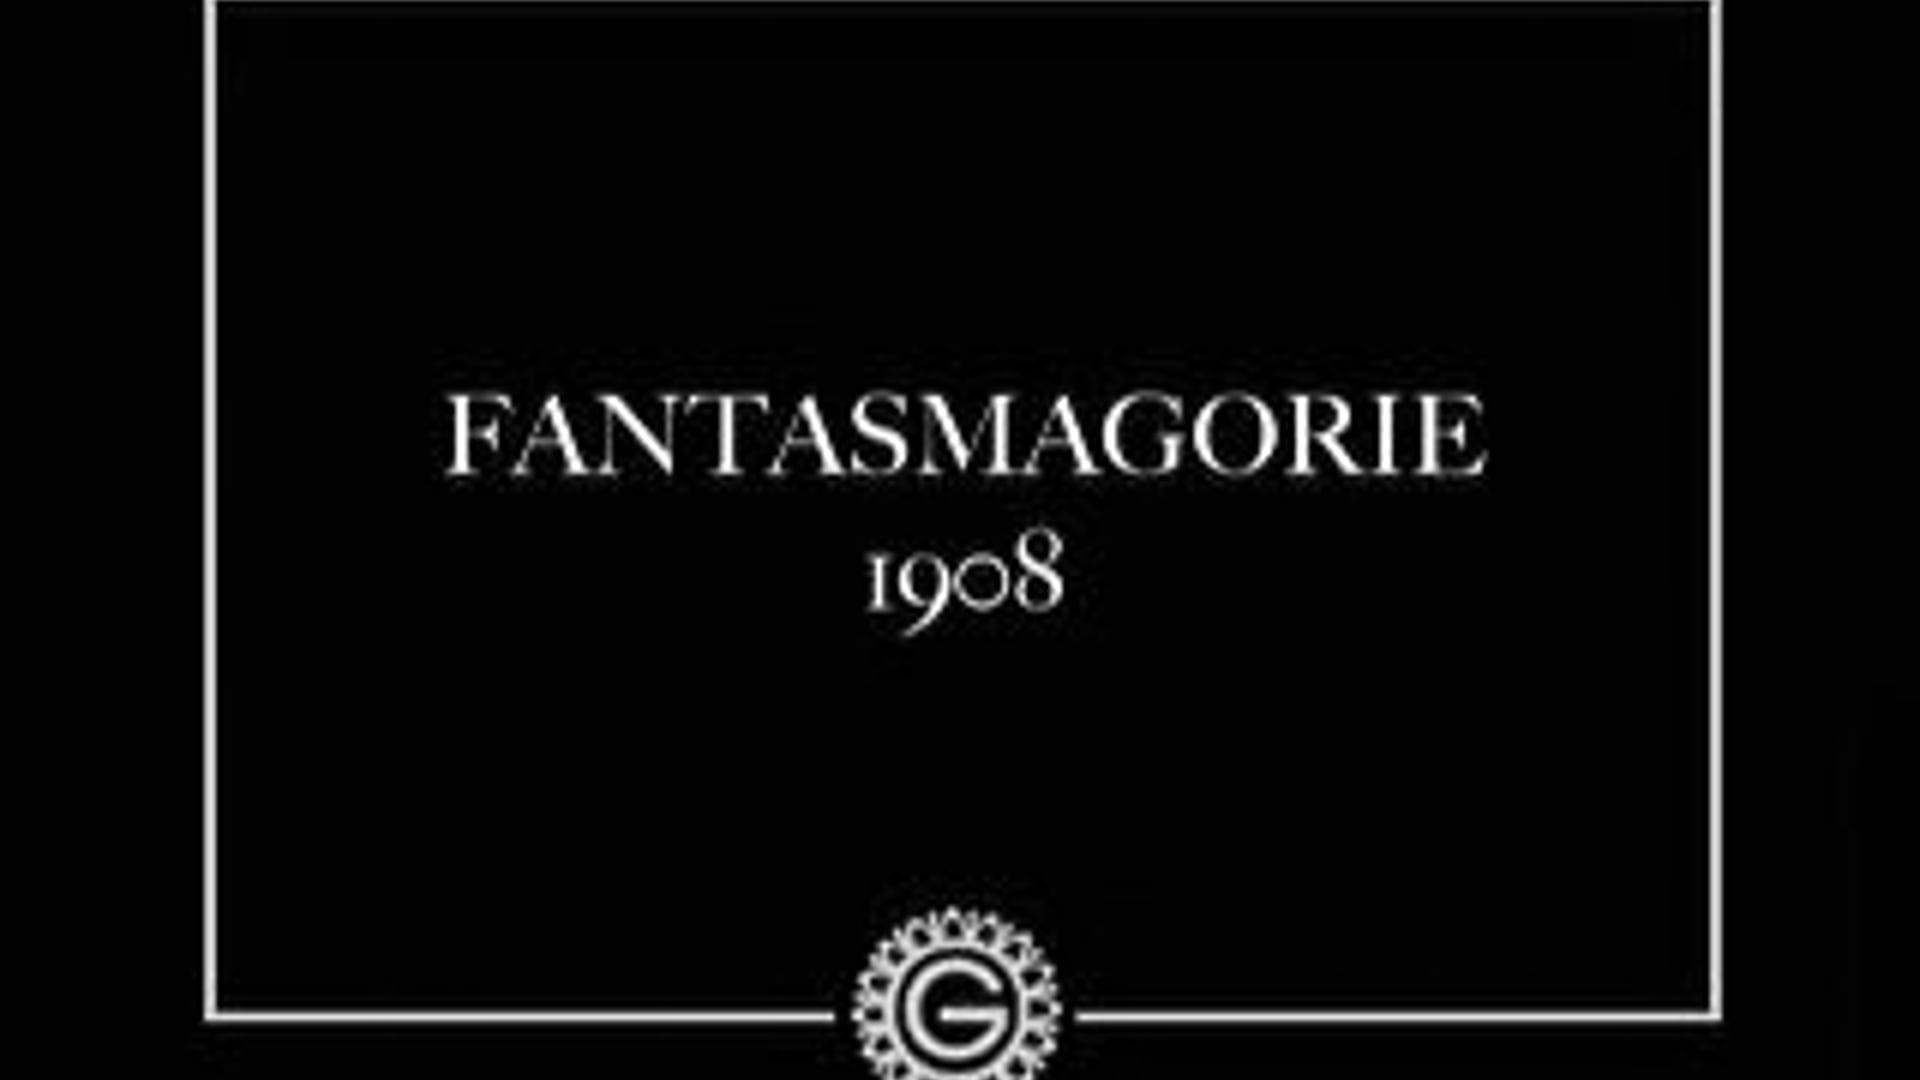 FANTASMAGORIE (1908)